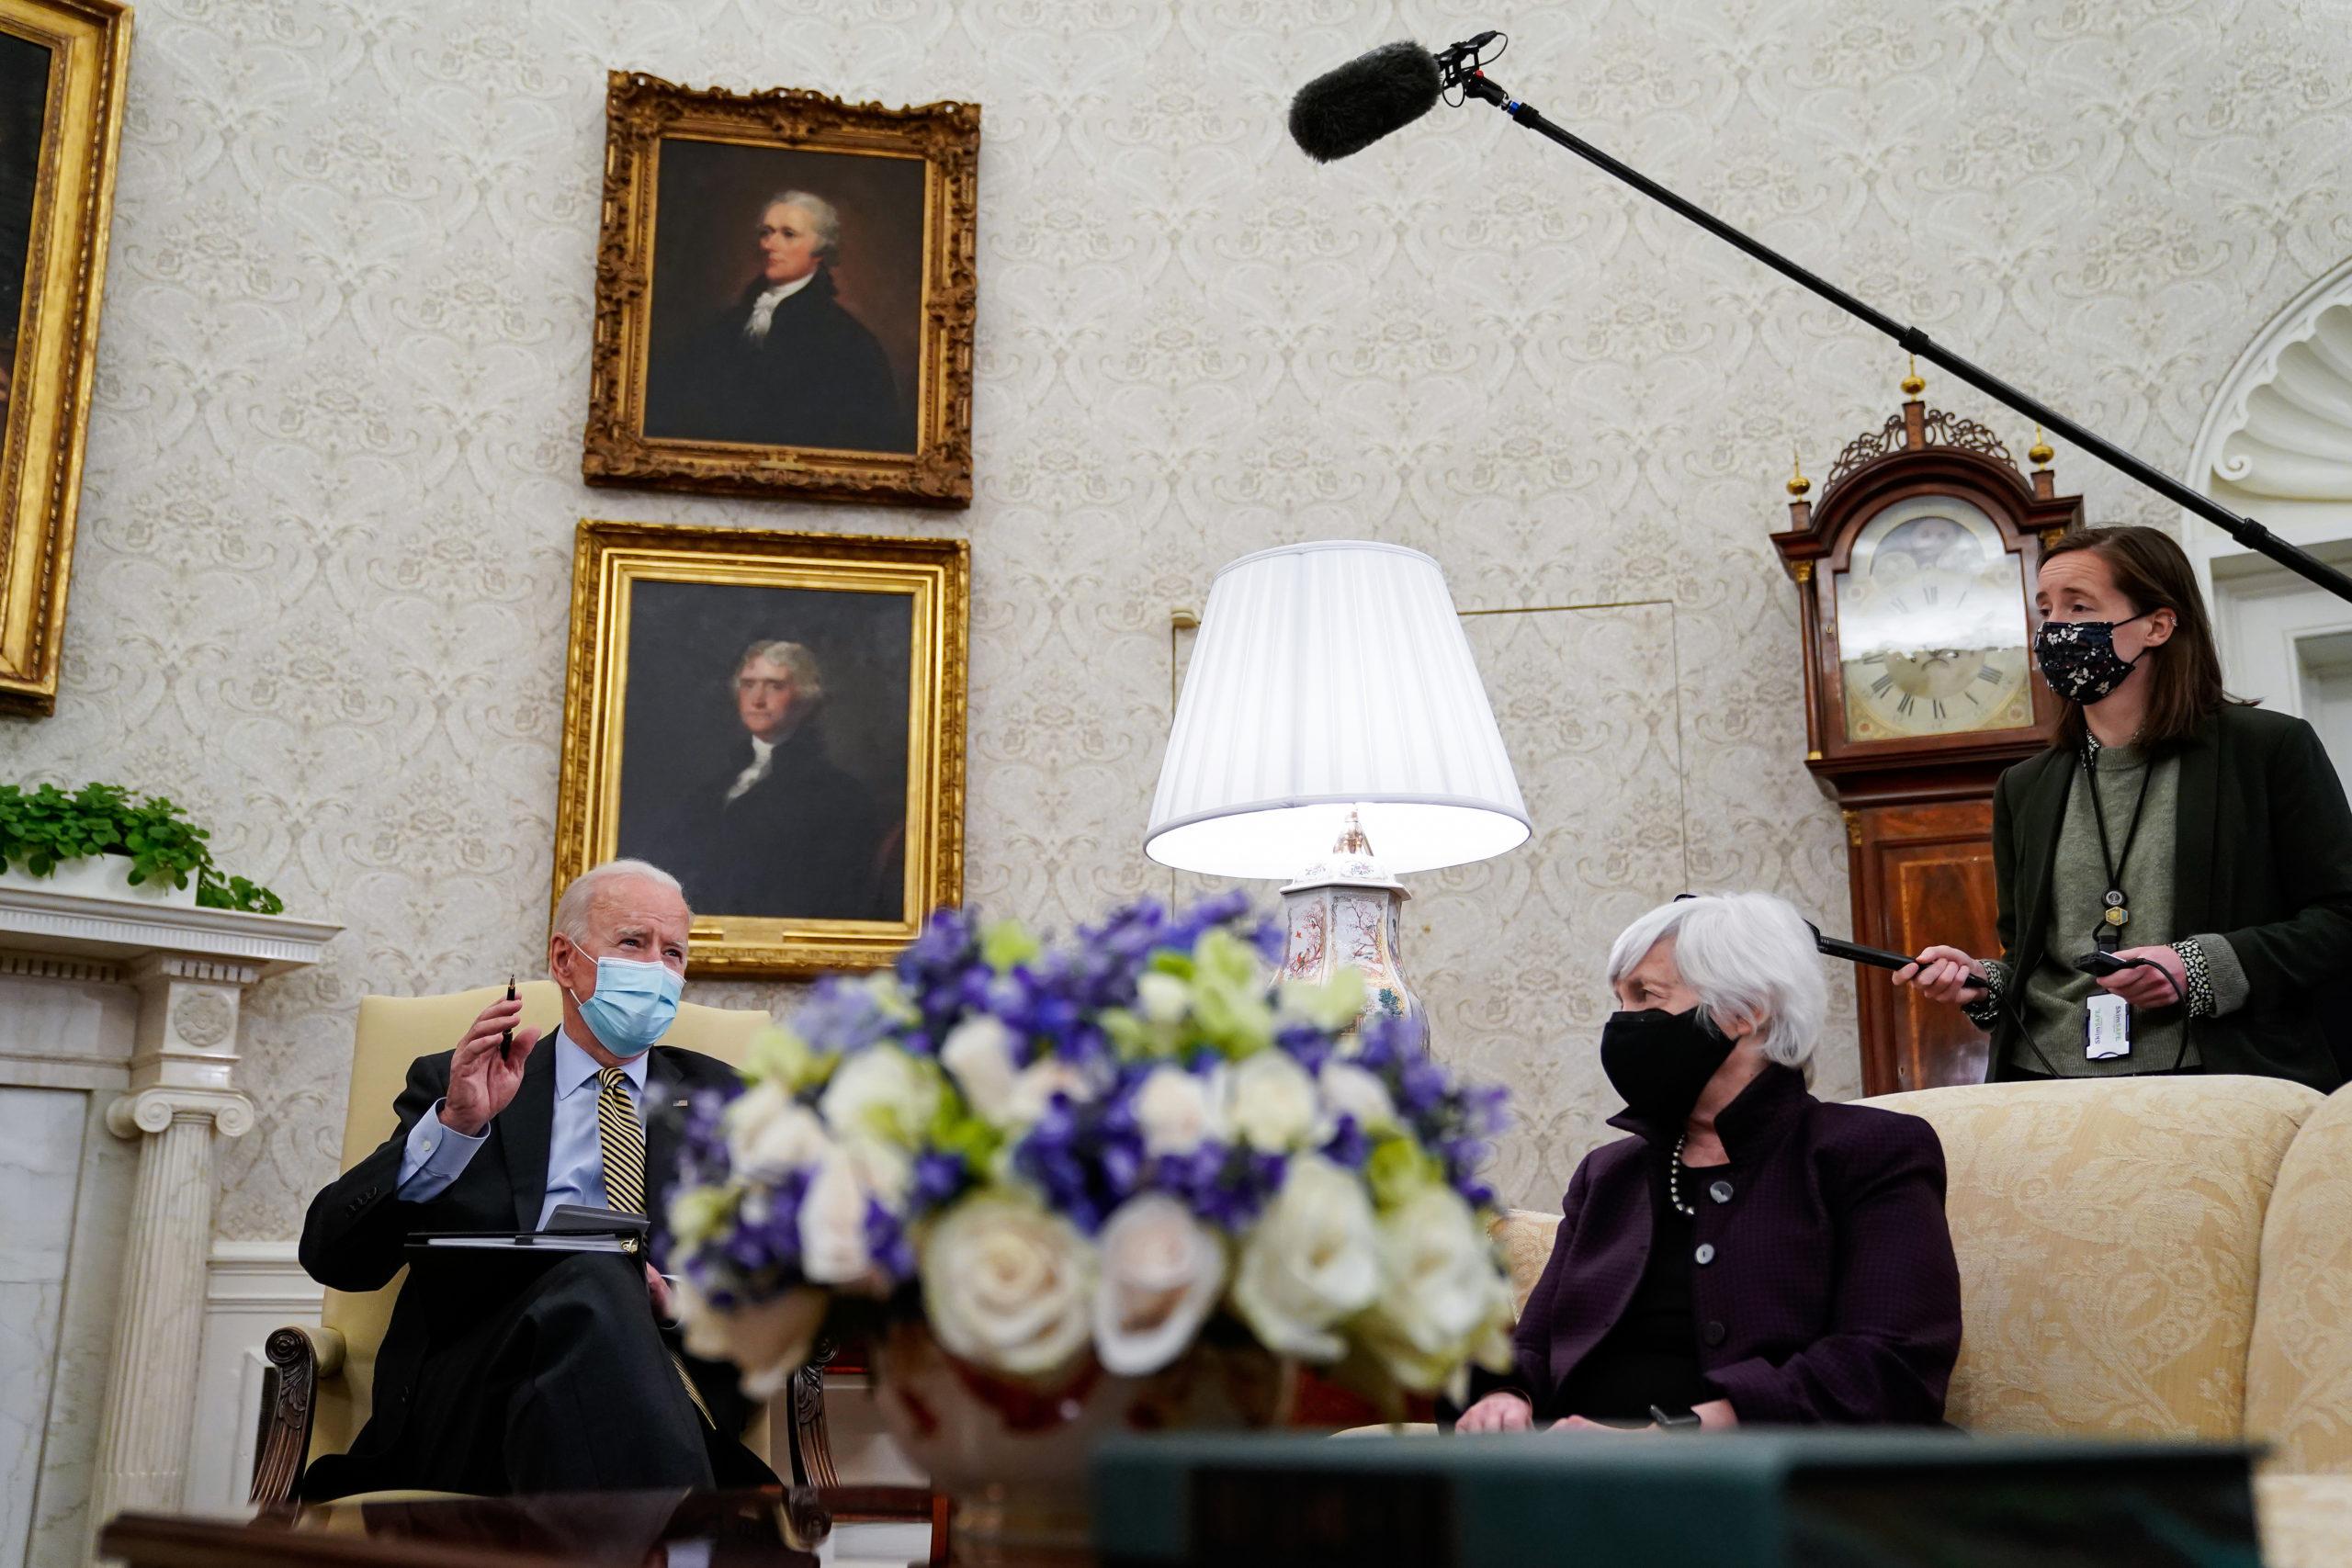 President Joe Biden speaks as Treasury Secretary Janet Yellen listens during a White House meeting on April 9. (Amr Alfiky/Pool/Getty Images)